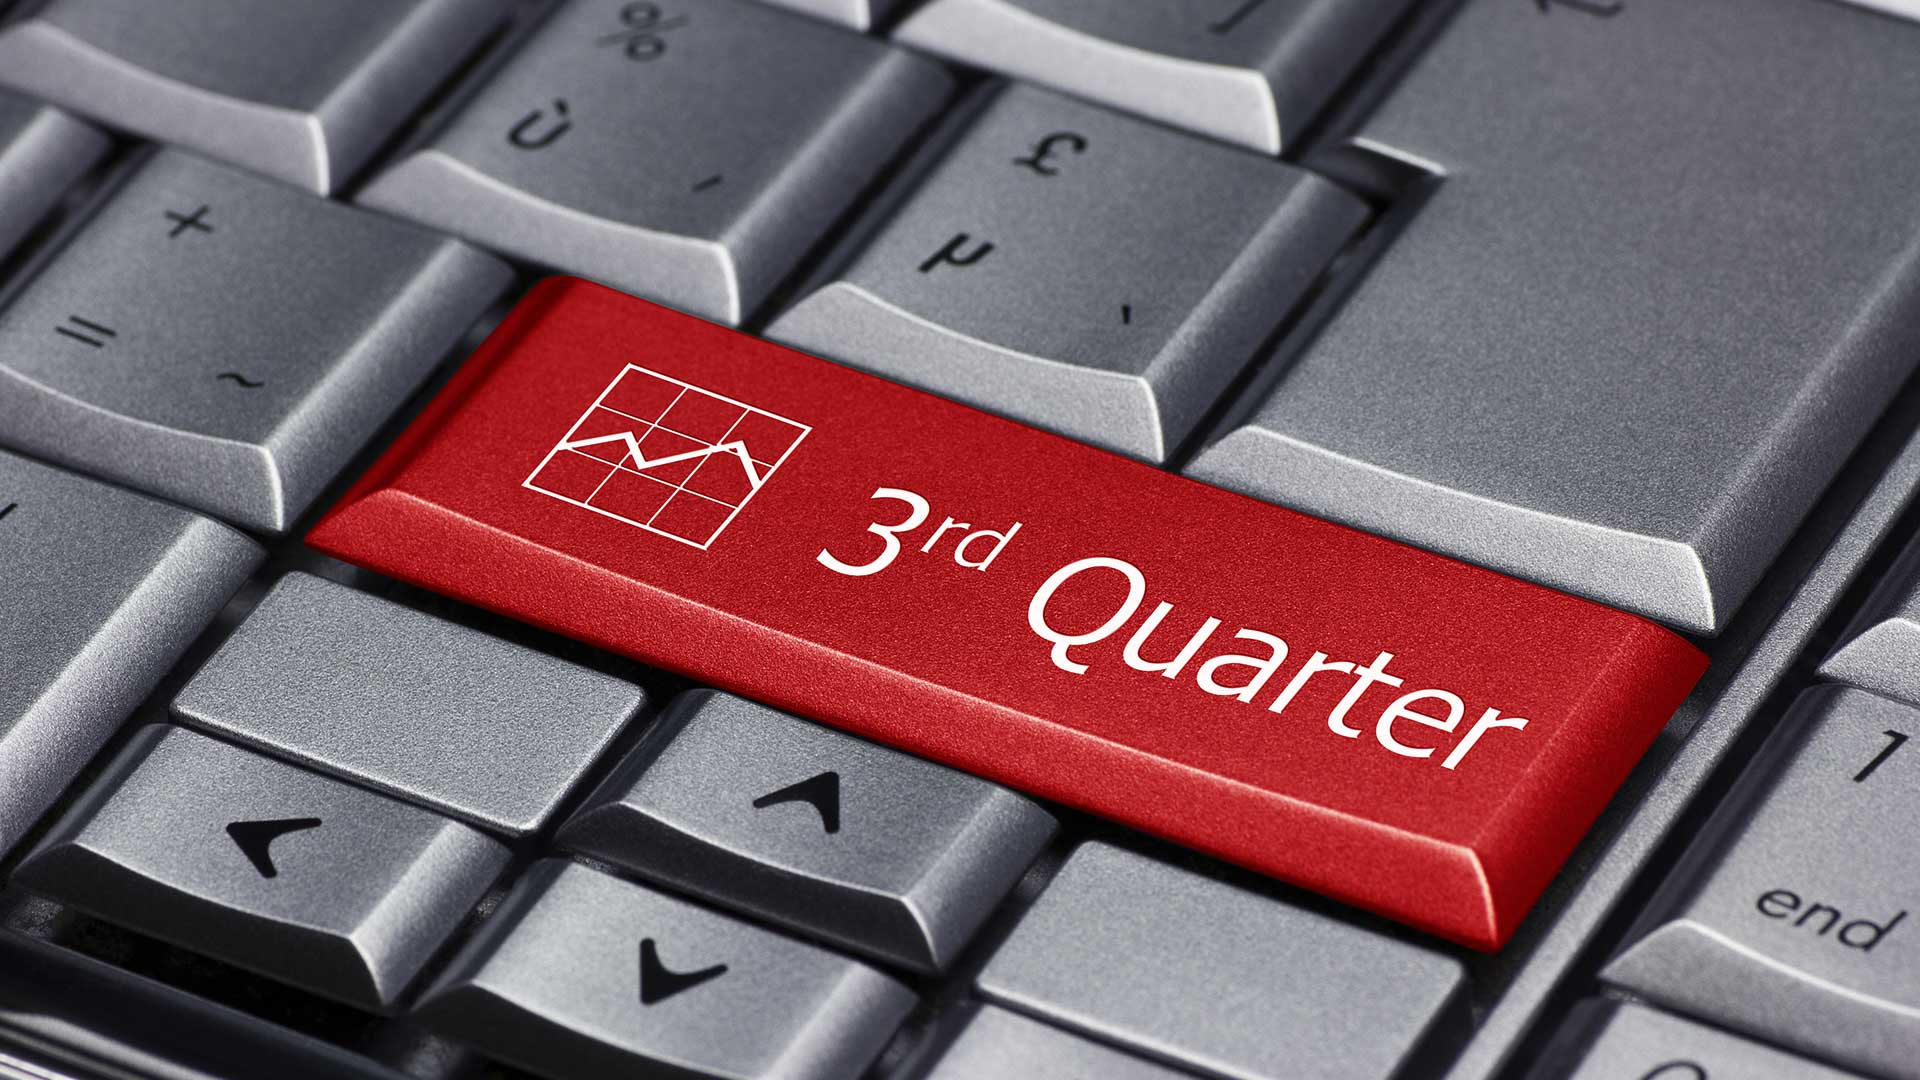 3rd Quarter Analysis